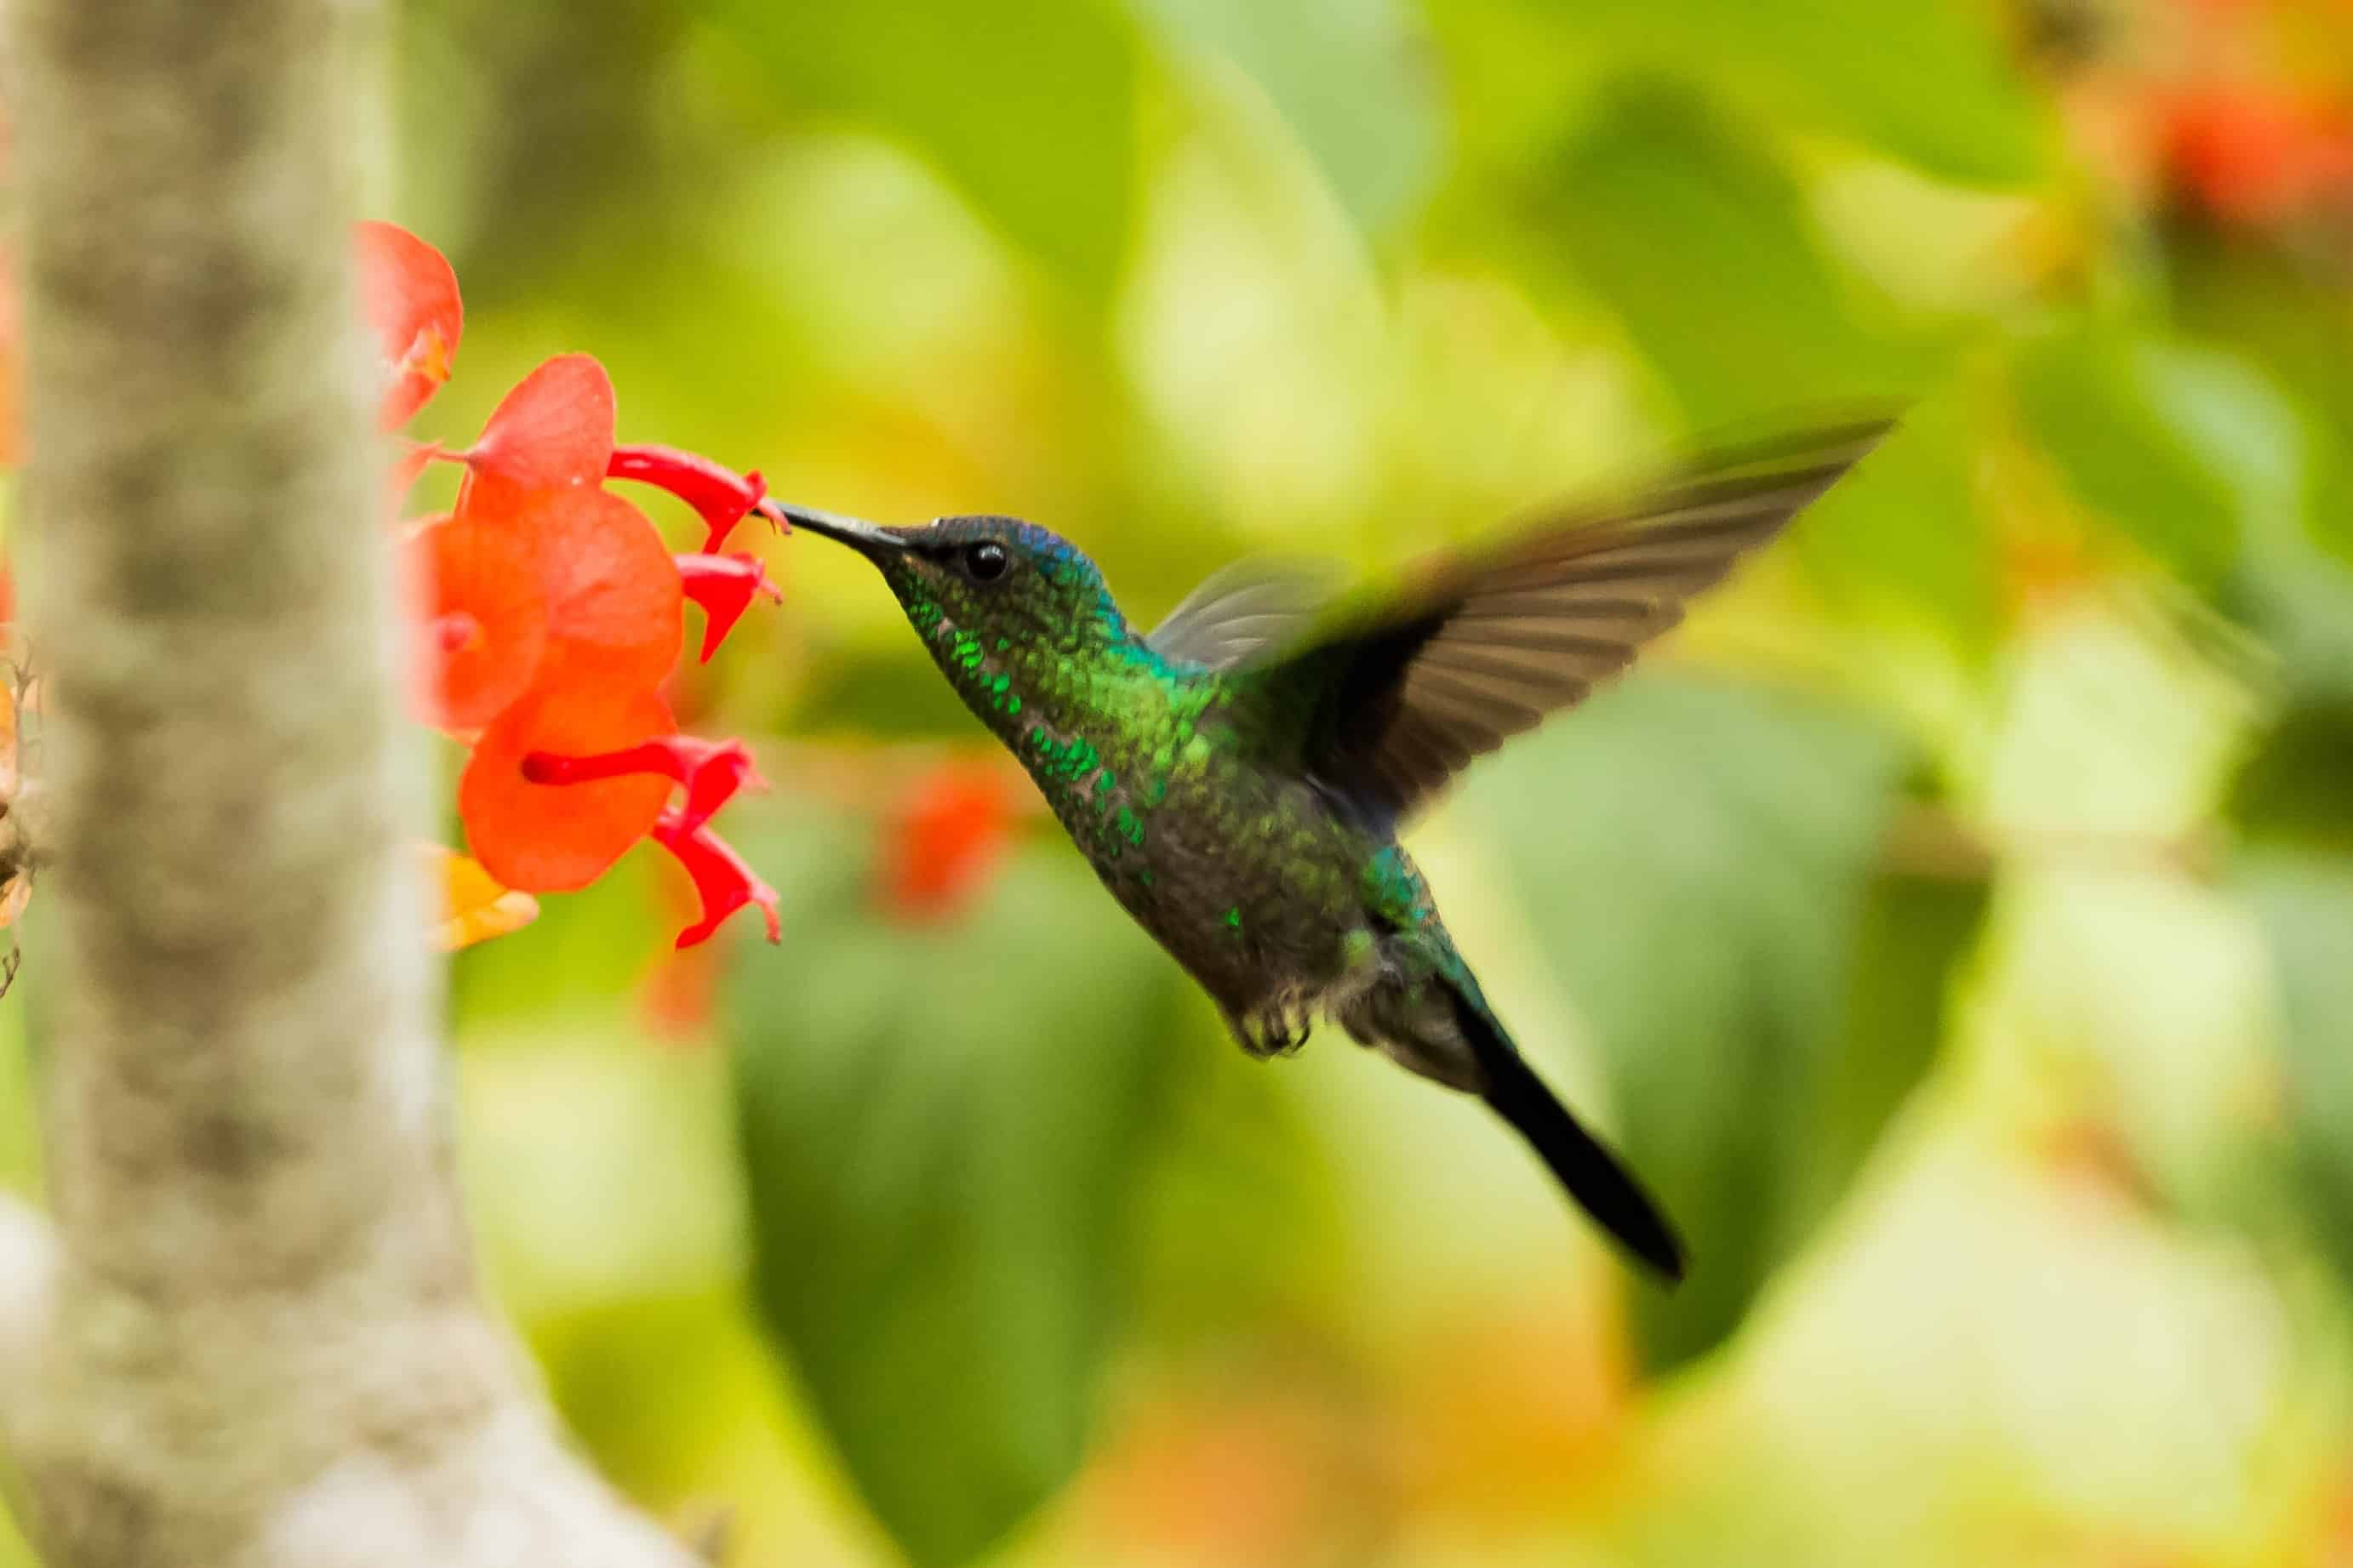 Flying Humming Bird is eating the flower nectar